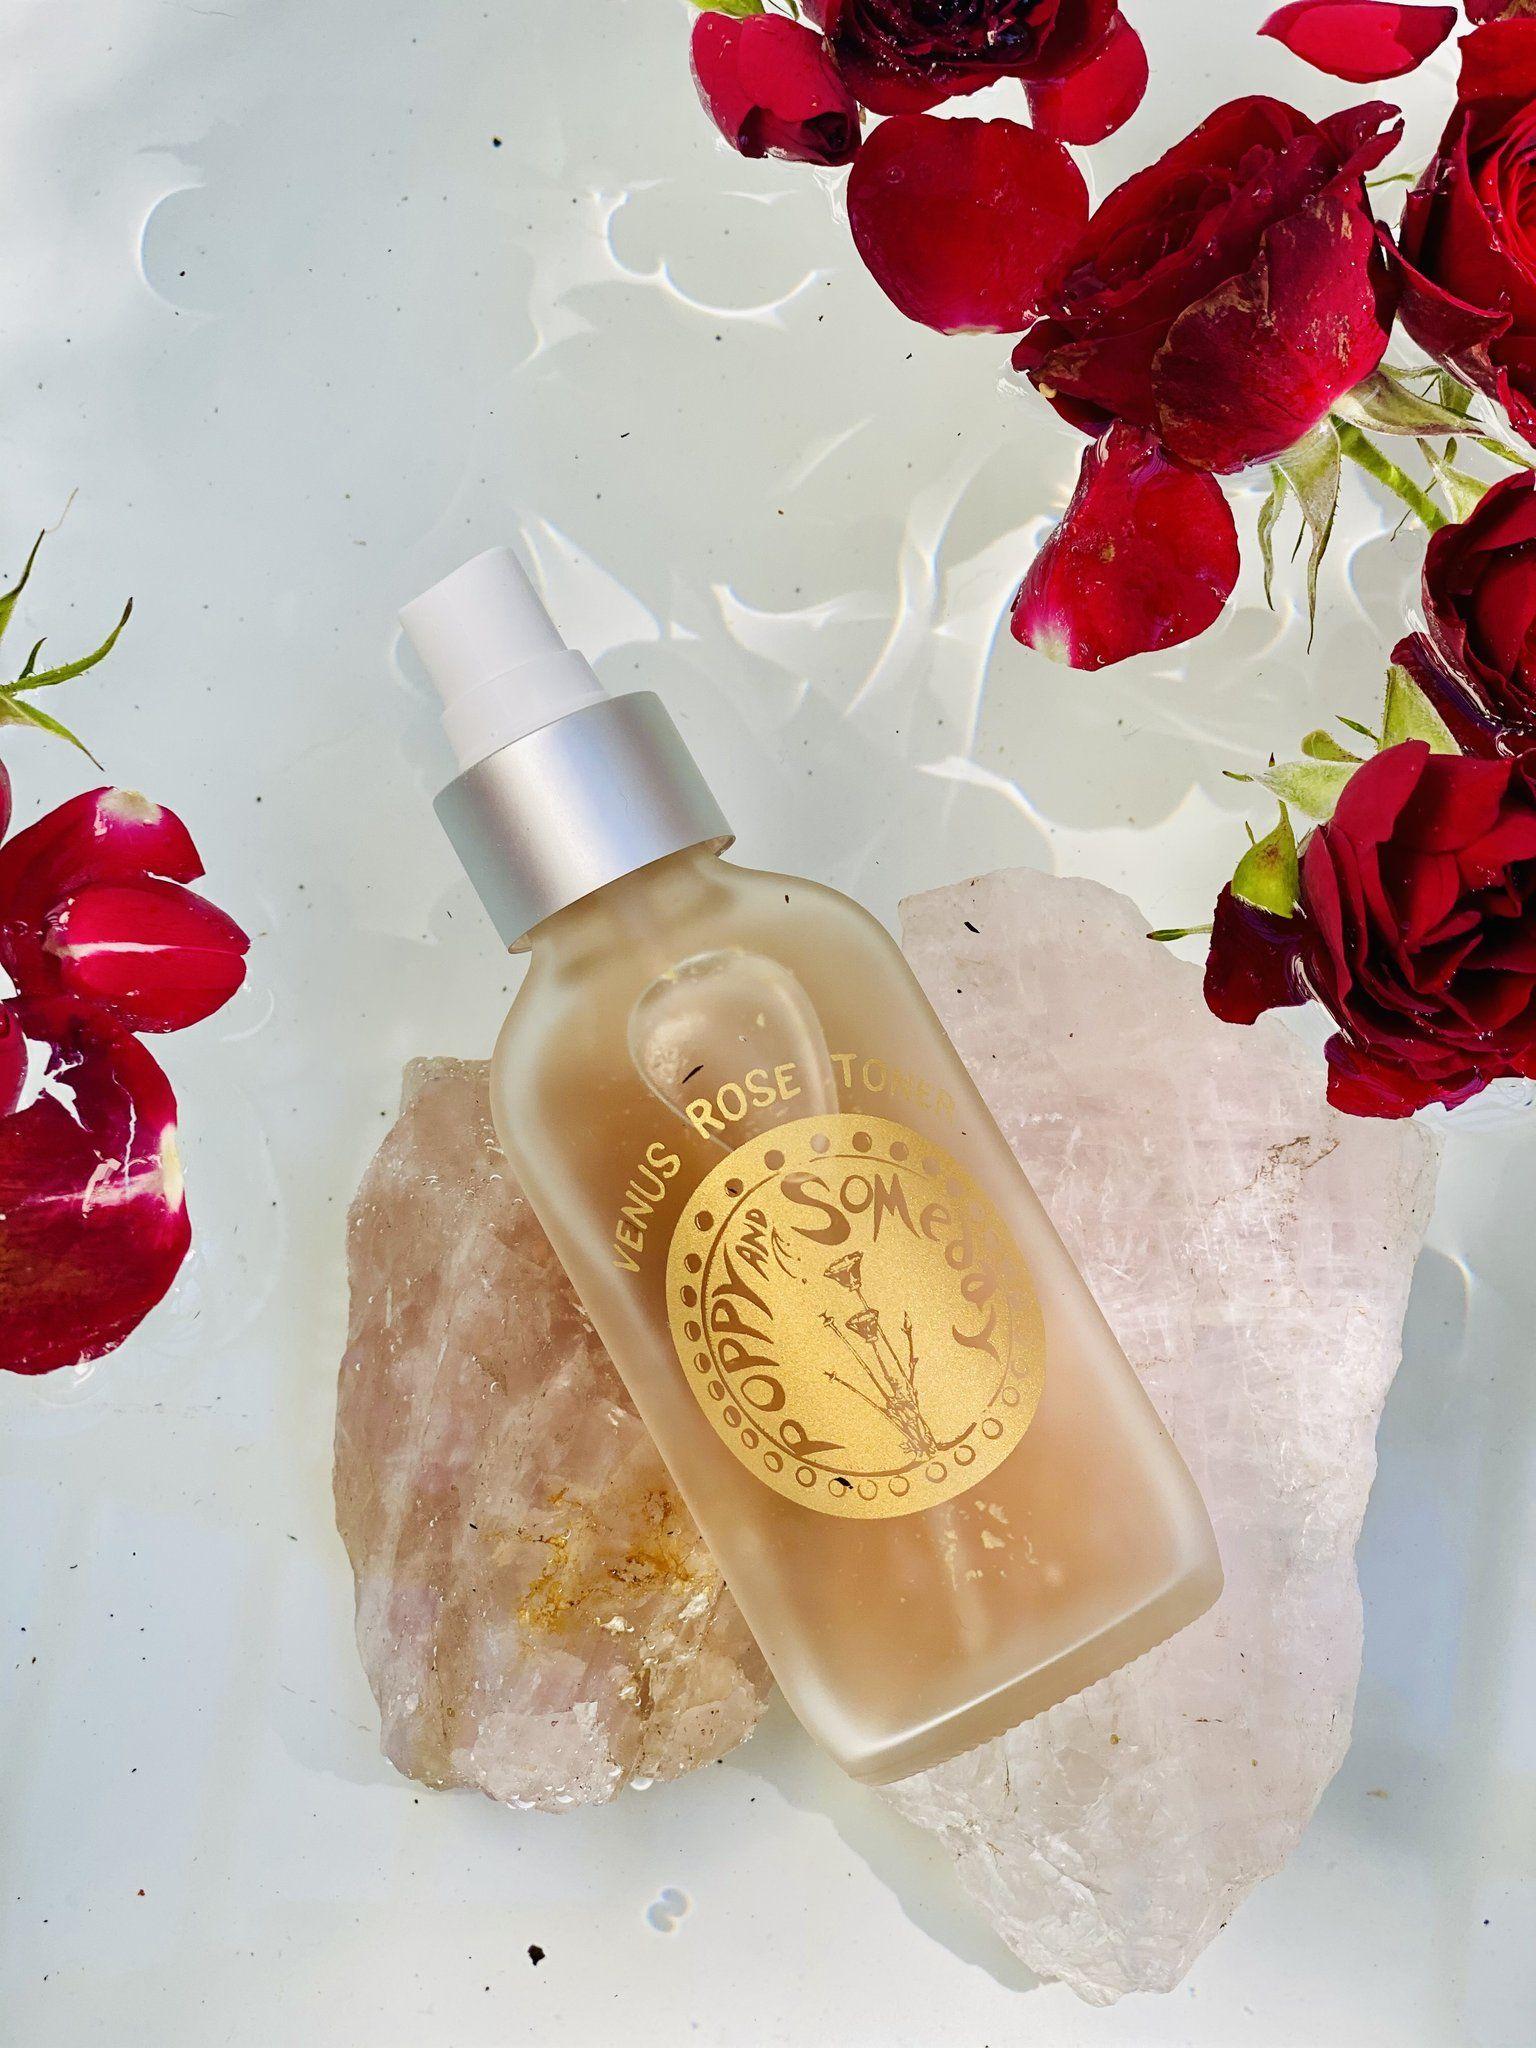 Product Image for Venus Rose Toner